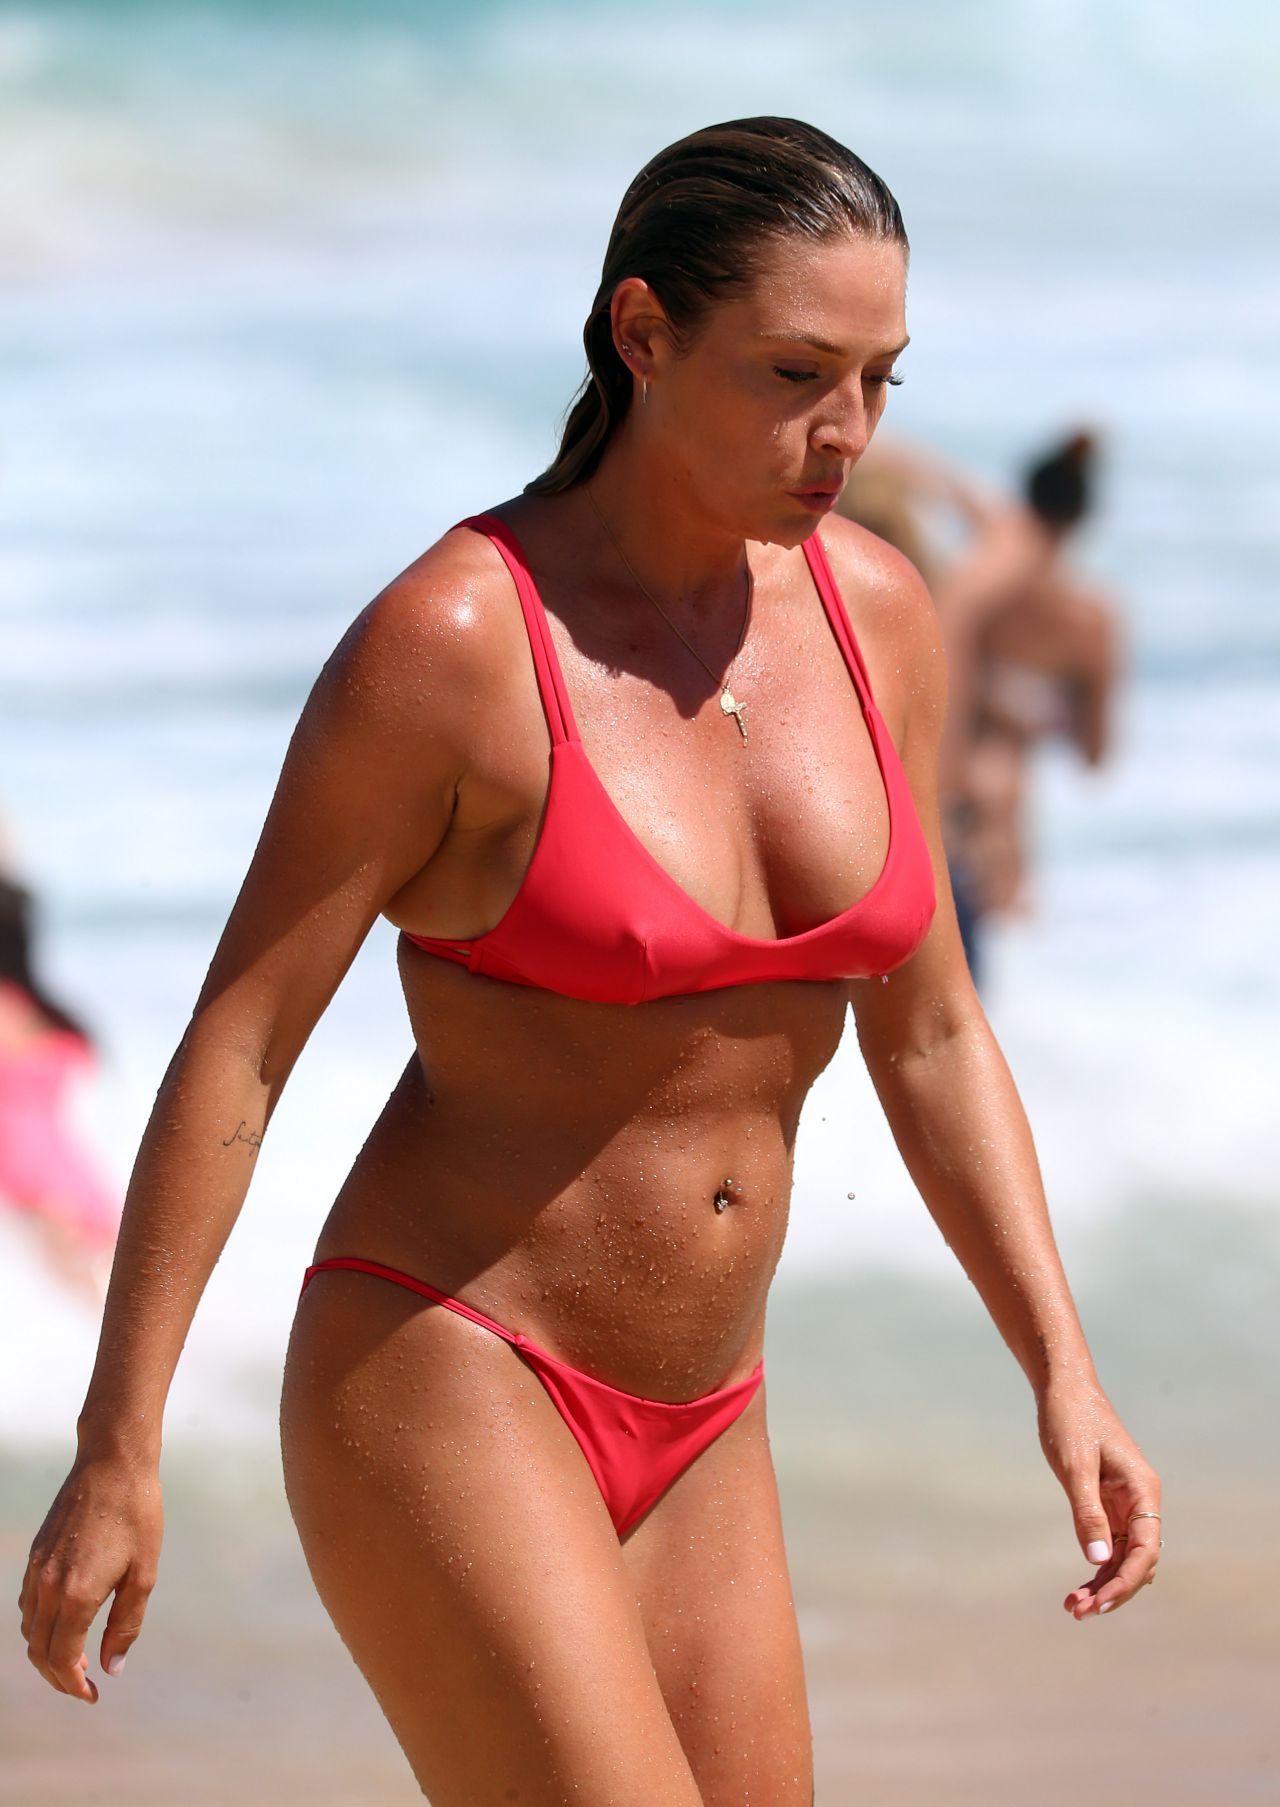 Montana Cox in Black Bikini at Tamarama beach in Sydney Pic 13 of 35